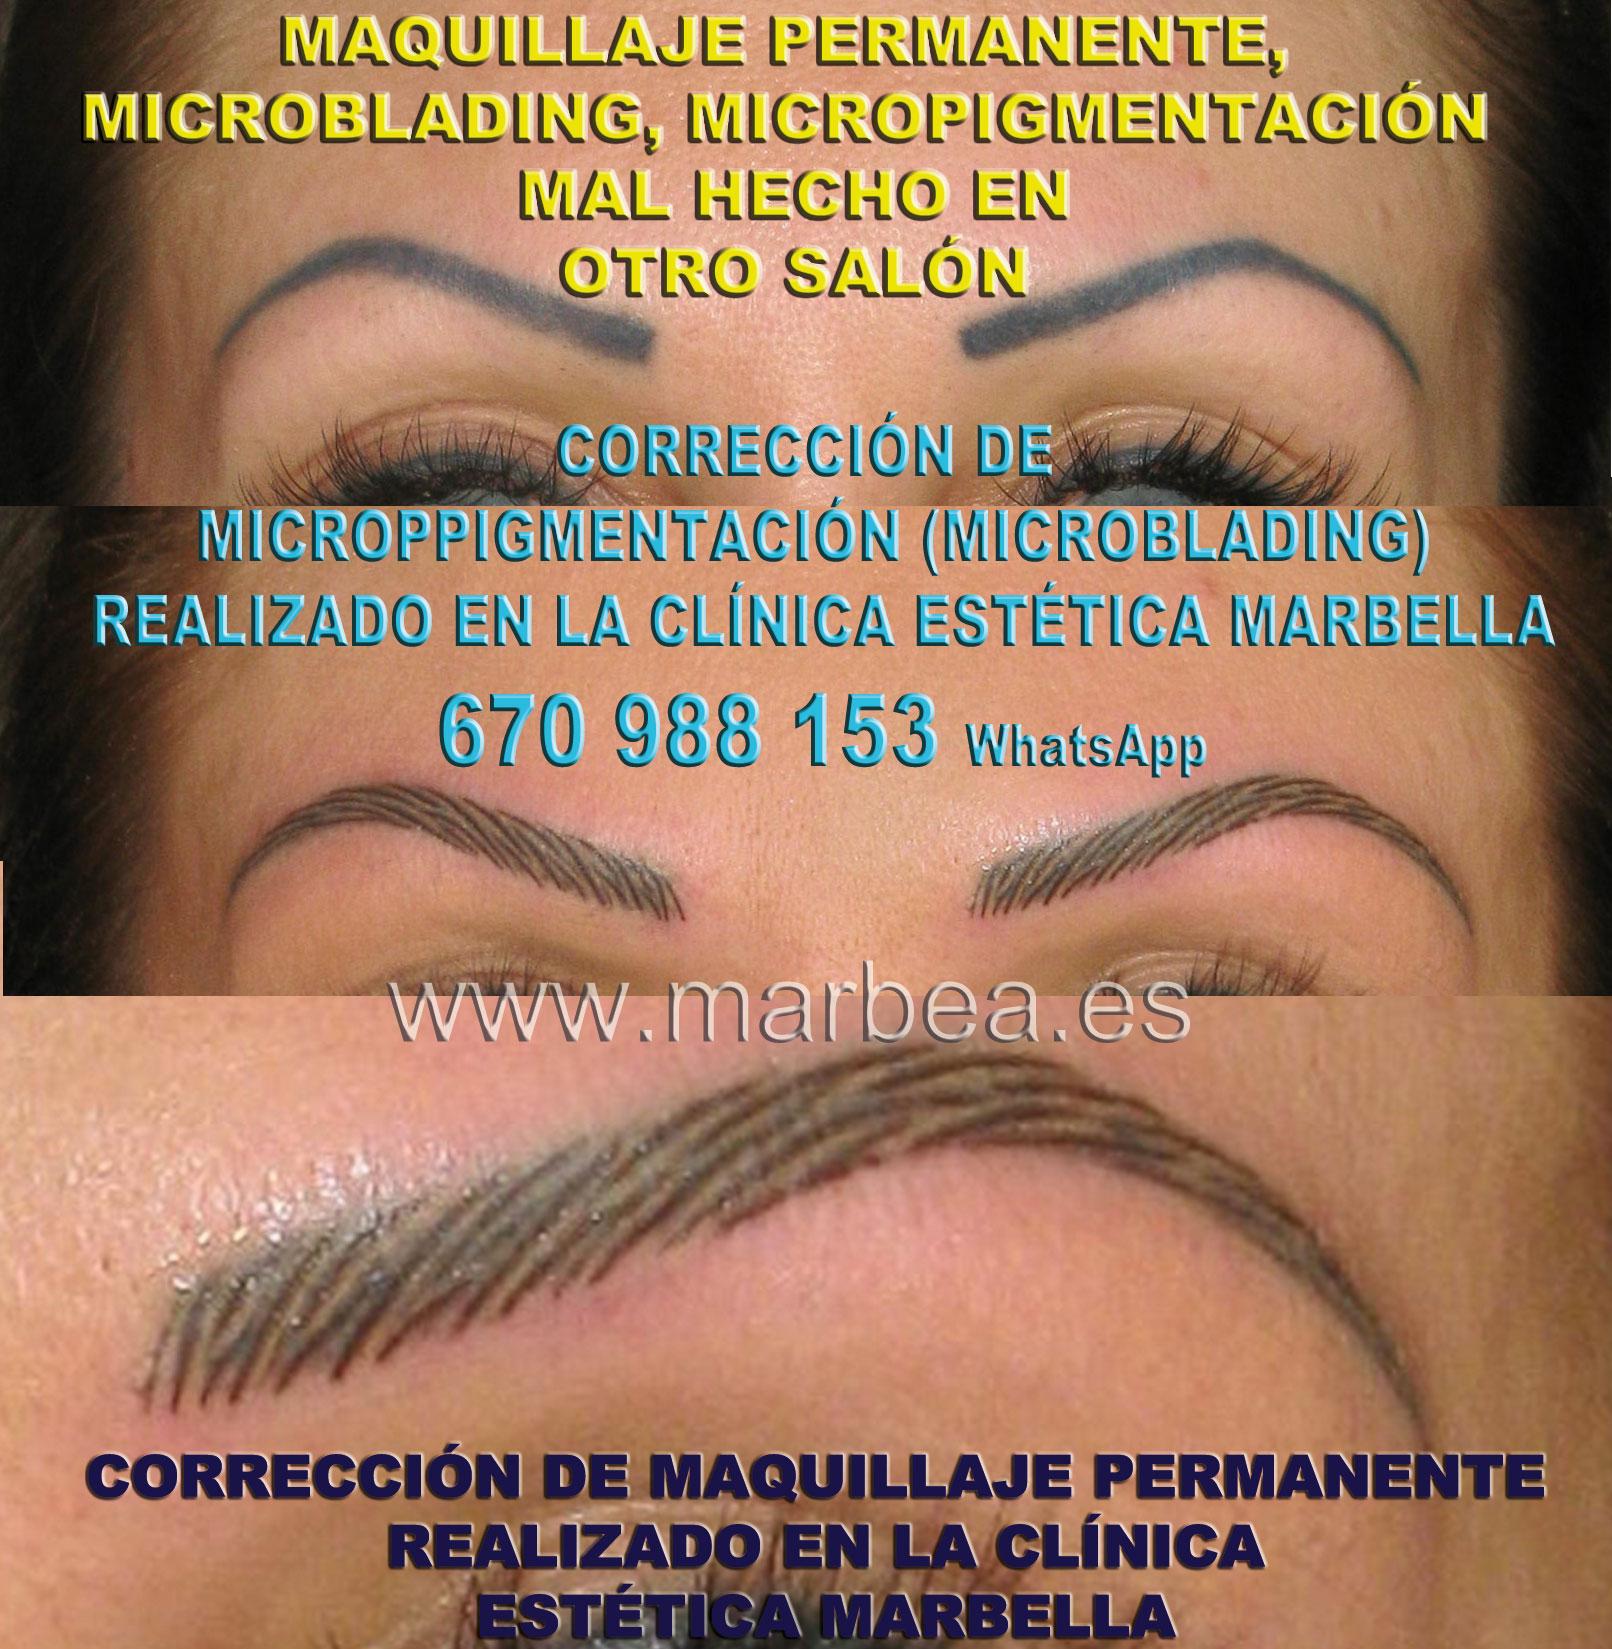 ELIMINAR MICROBLADING CEJAS clínica estética micropigmentación entrega como aclarar la micropigmentación cejas,micropigmentación correctiva cejas mal hecha